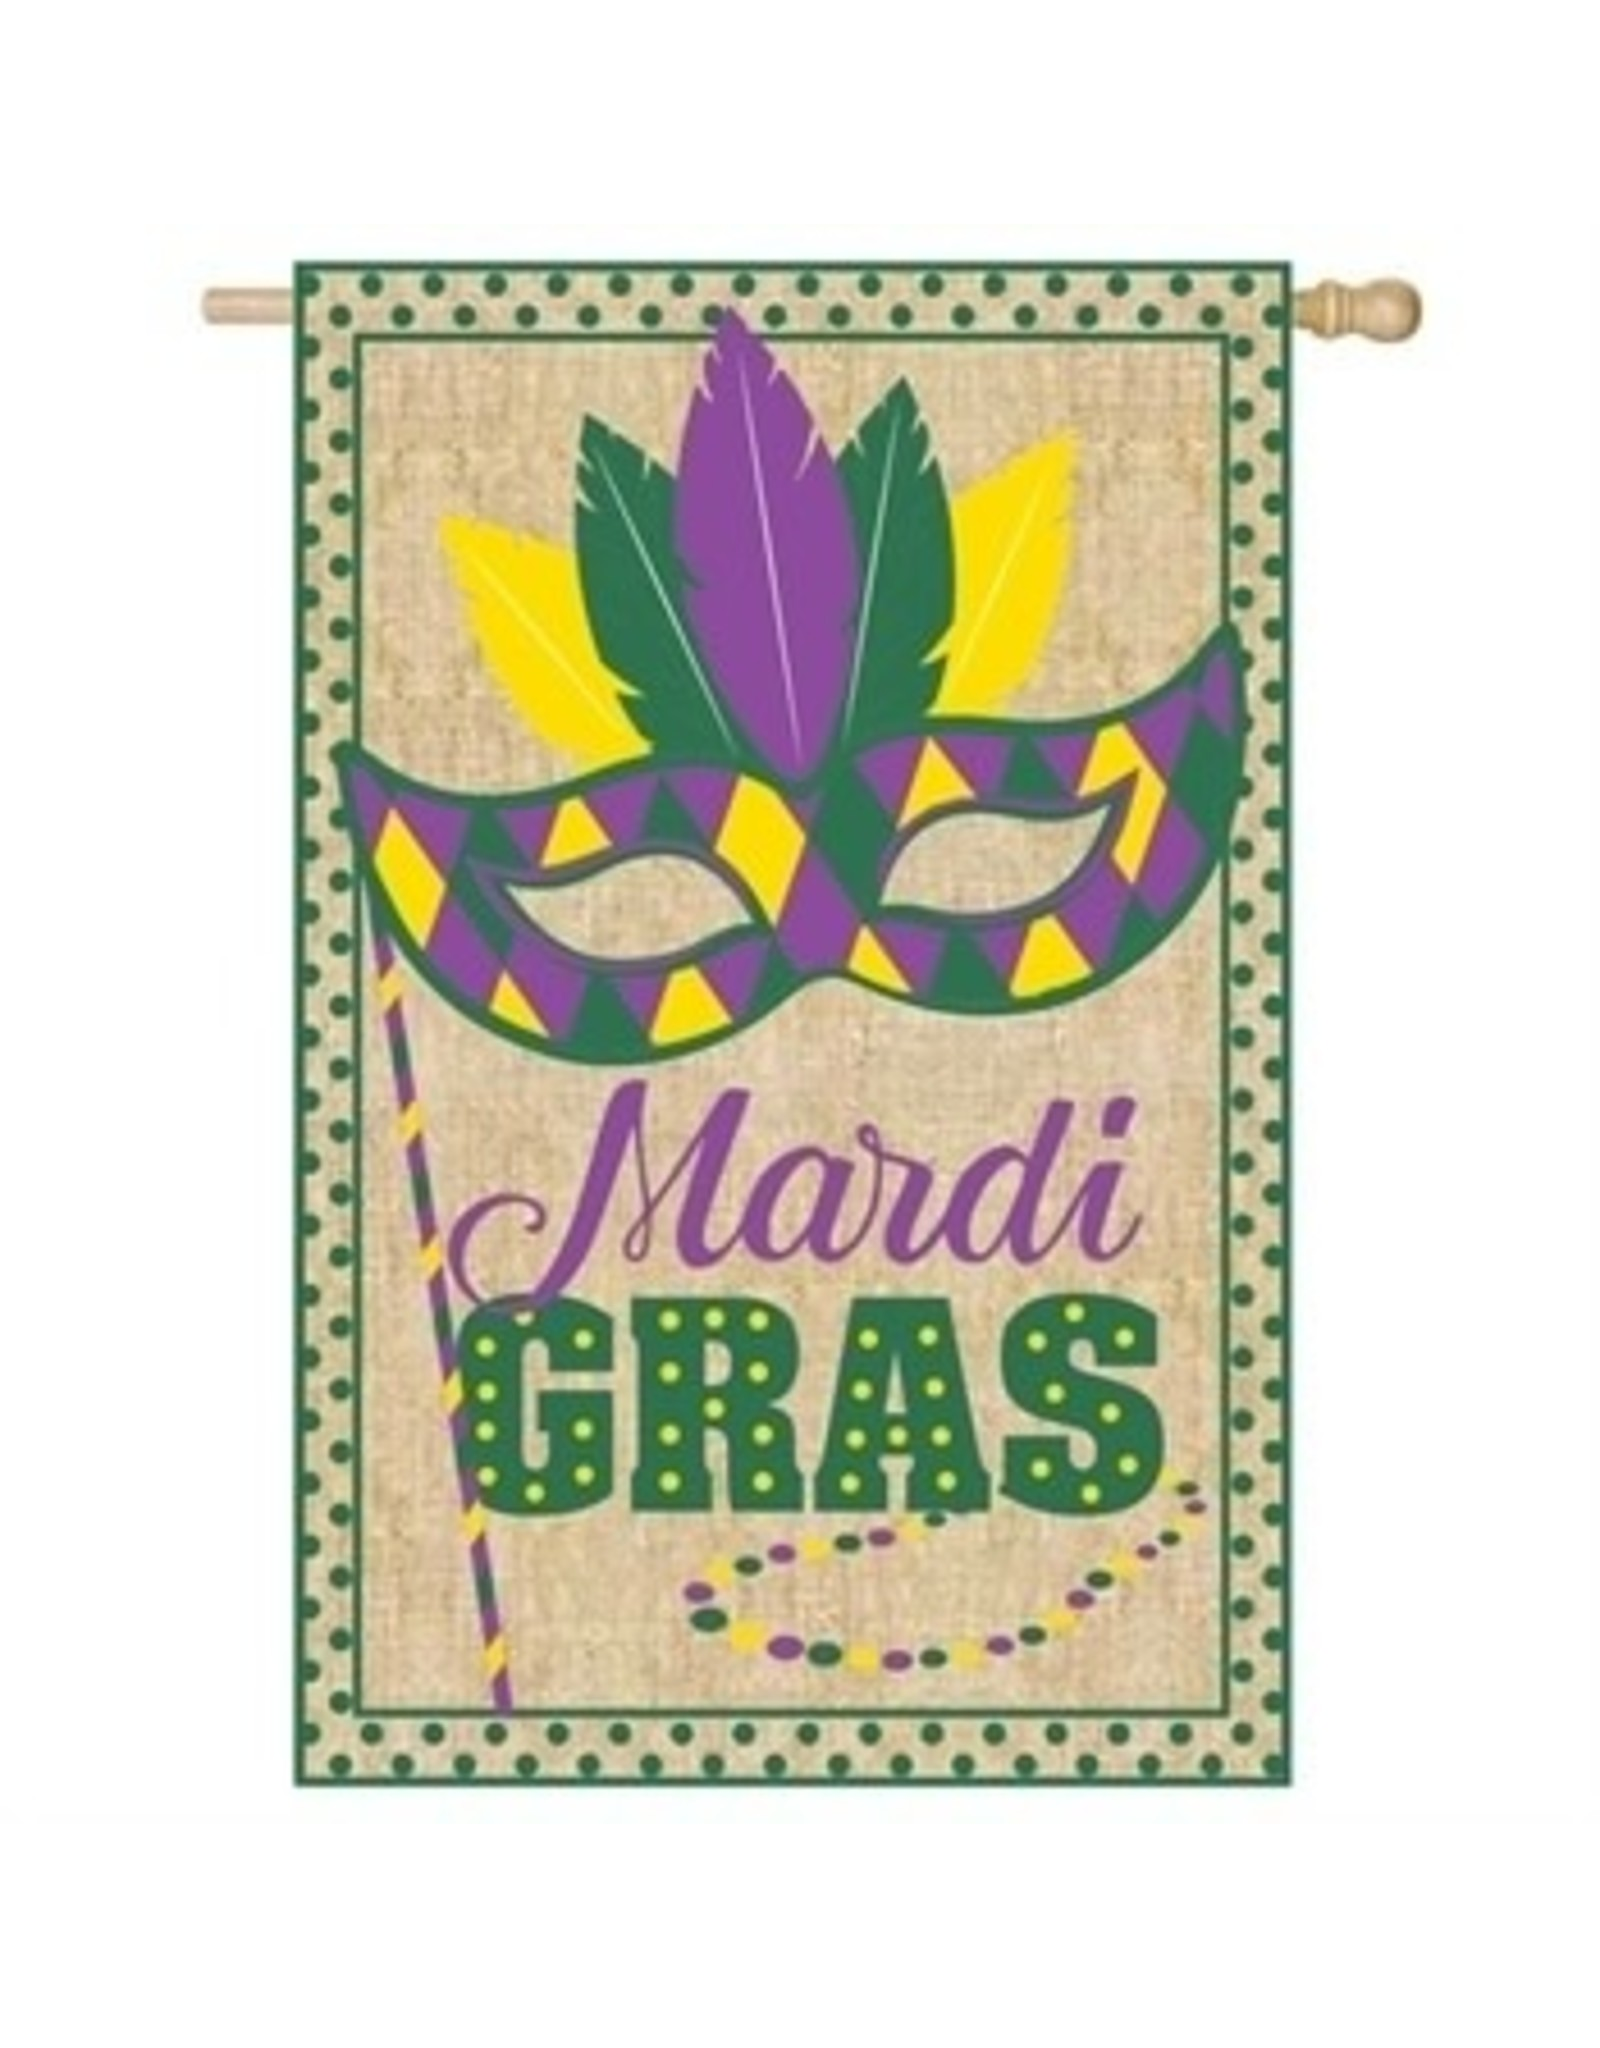 Evergreen Enterprises Mardi Gras House Burlap Flag